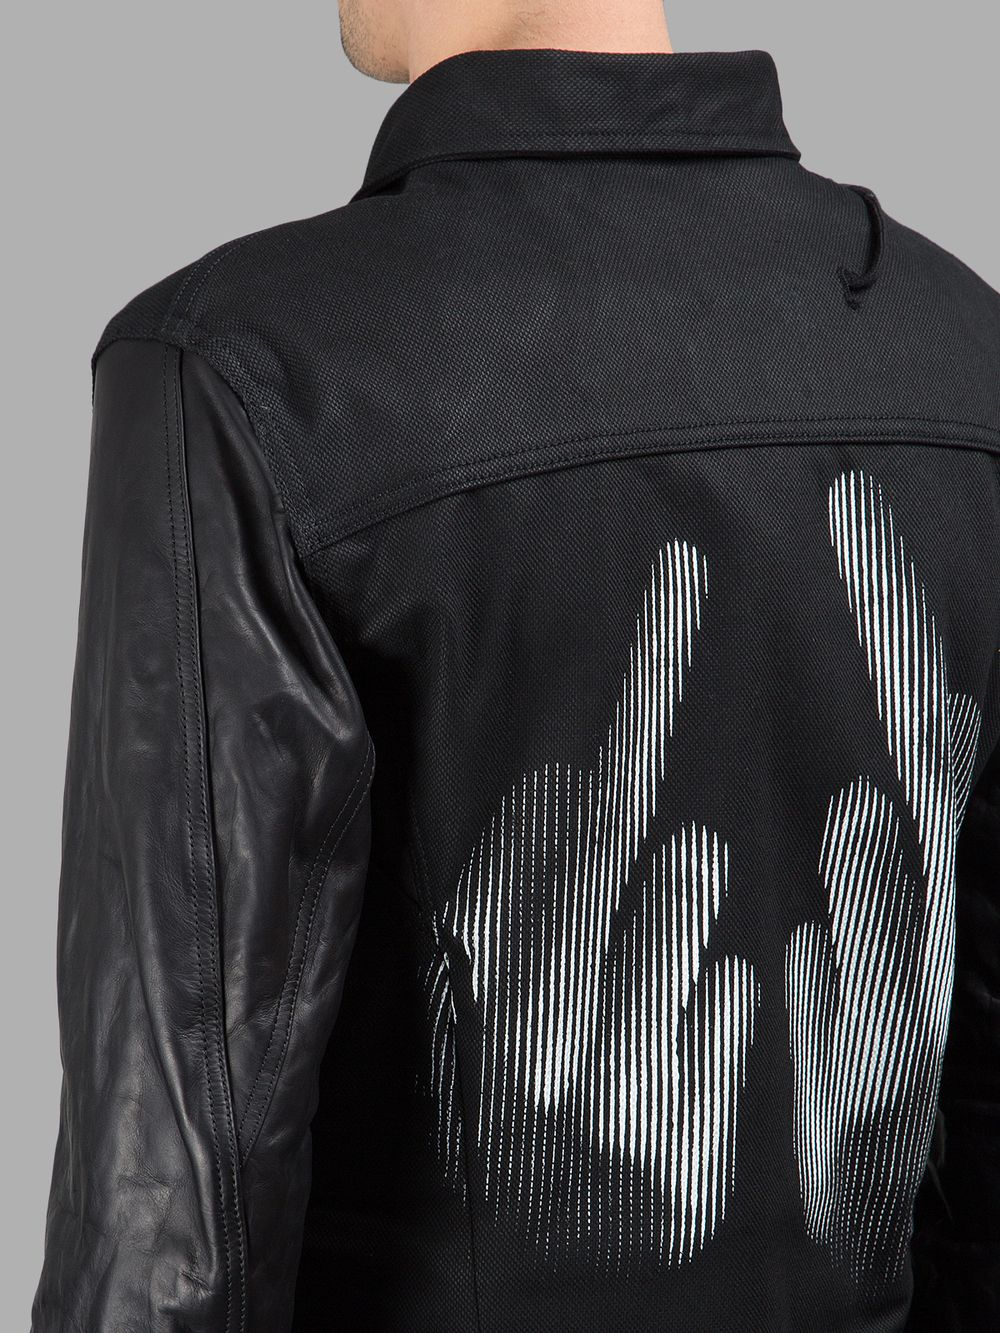 Sweatshirt Hip Hop Streetwear Herren 3d Druck Schädel Sensenmann Sport Fitness Kleidung Frühling Langarm Rundhals Top Pullover